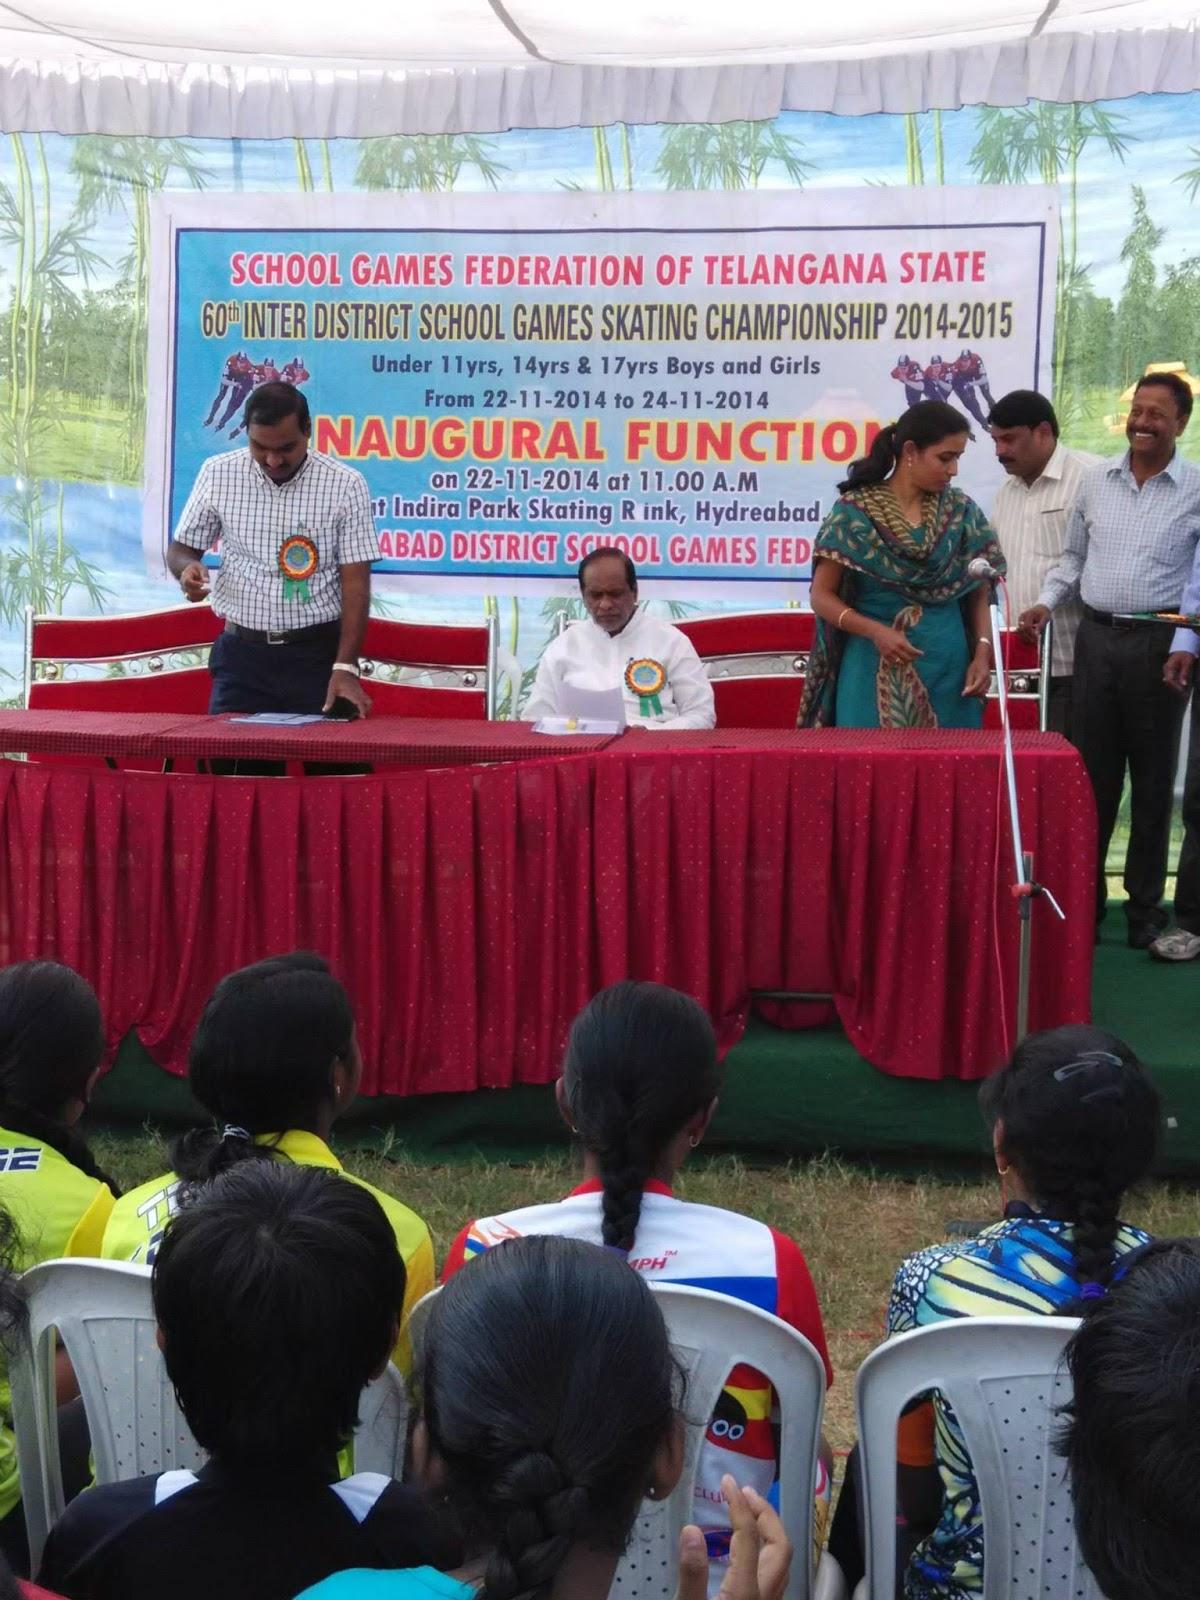 skating classes at filmnagar in hyderabad  mla colony banjara hills  panjagutta free style  sr nagar gachibowli